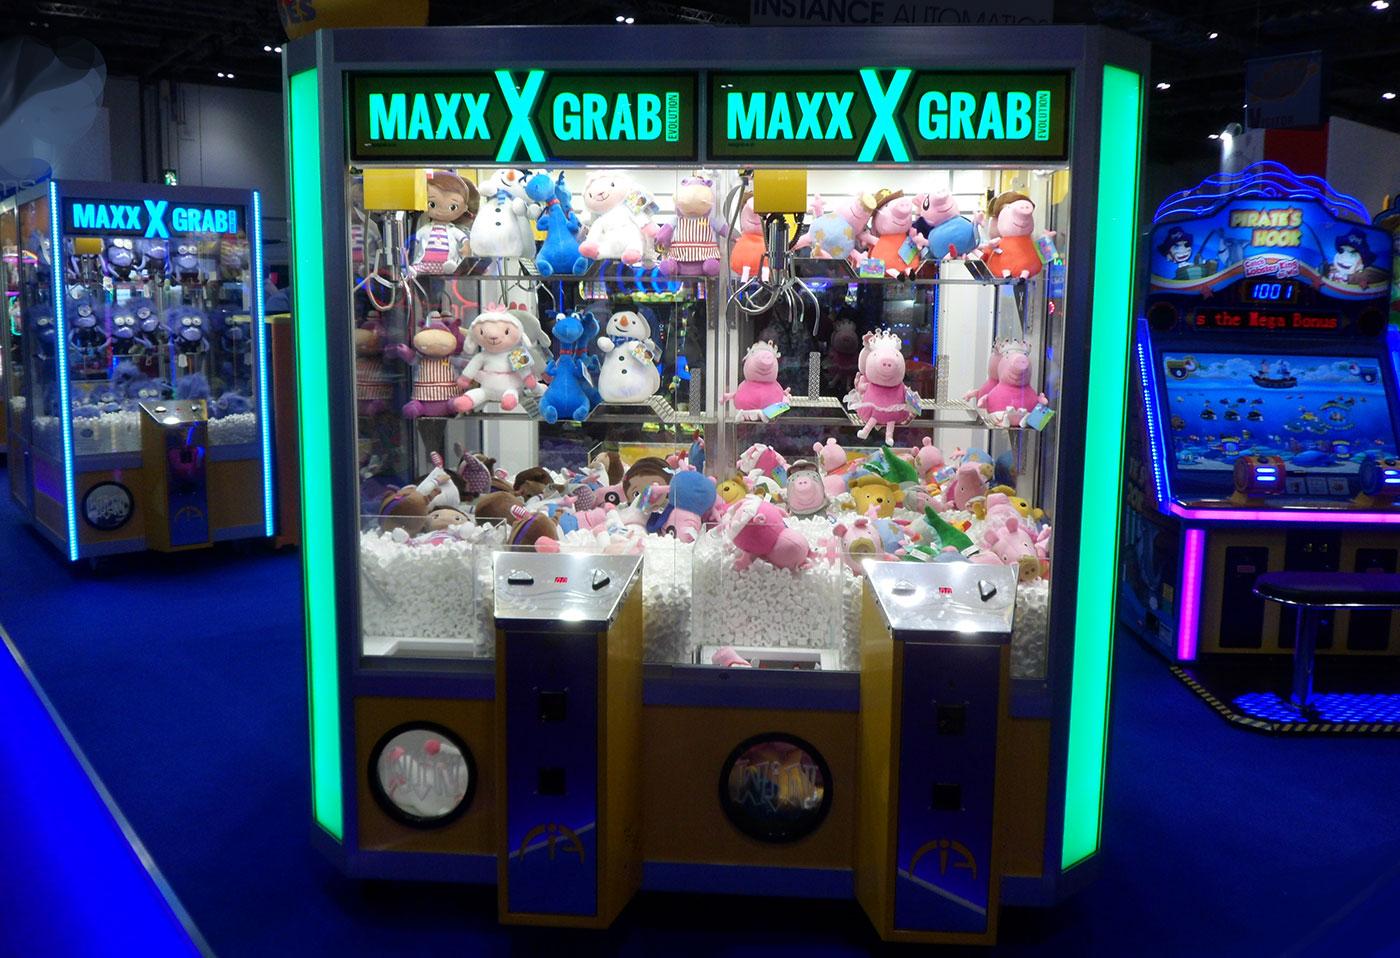 maxx grab crane in arcade